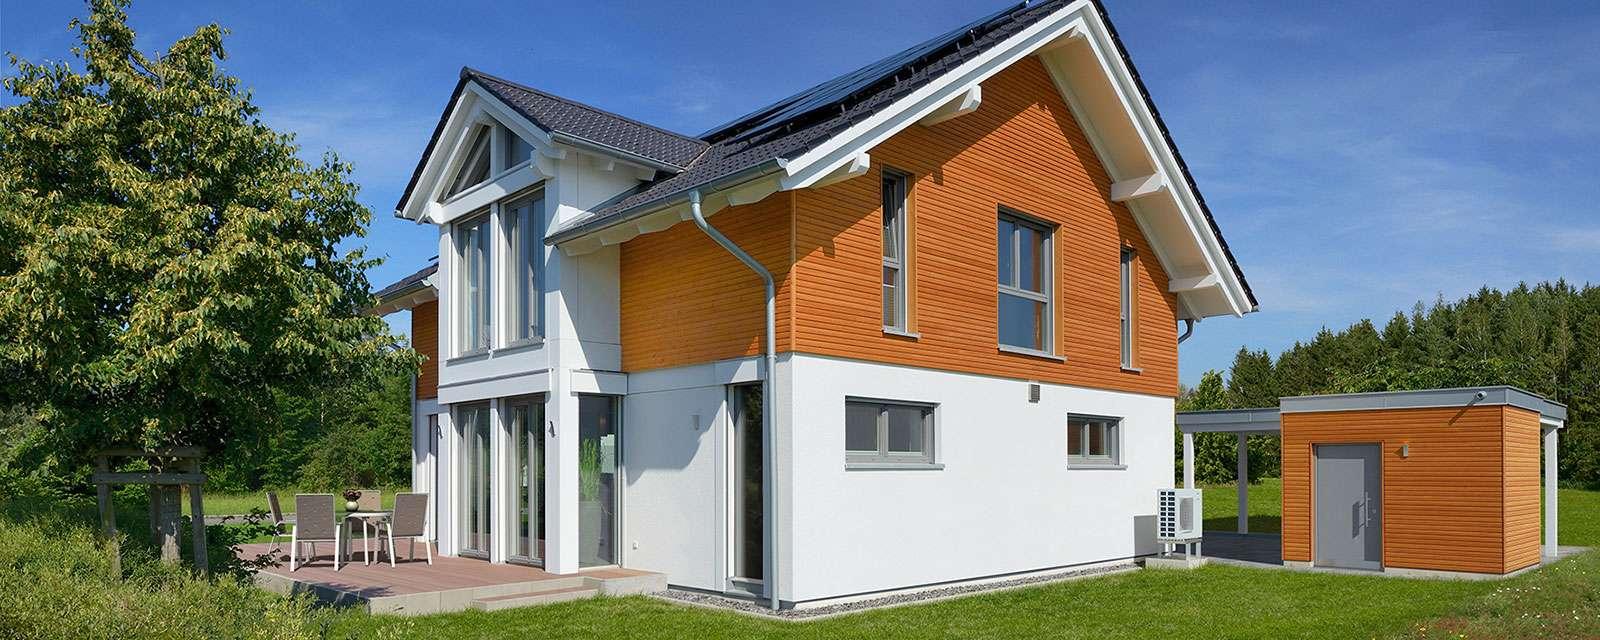 Moderne Holzfassade